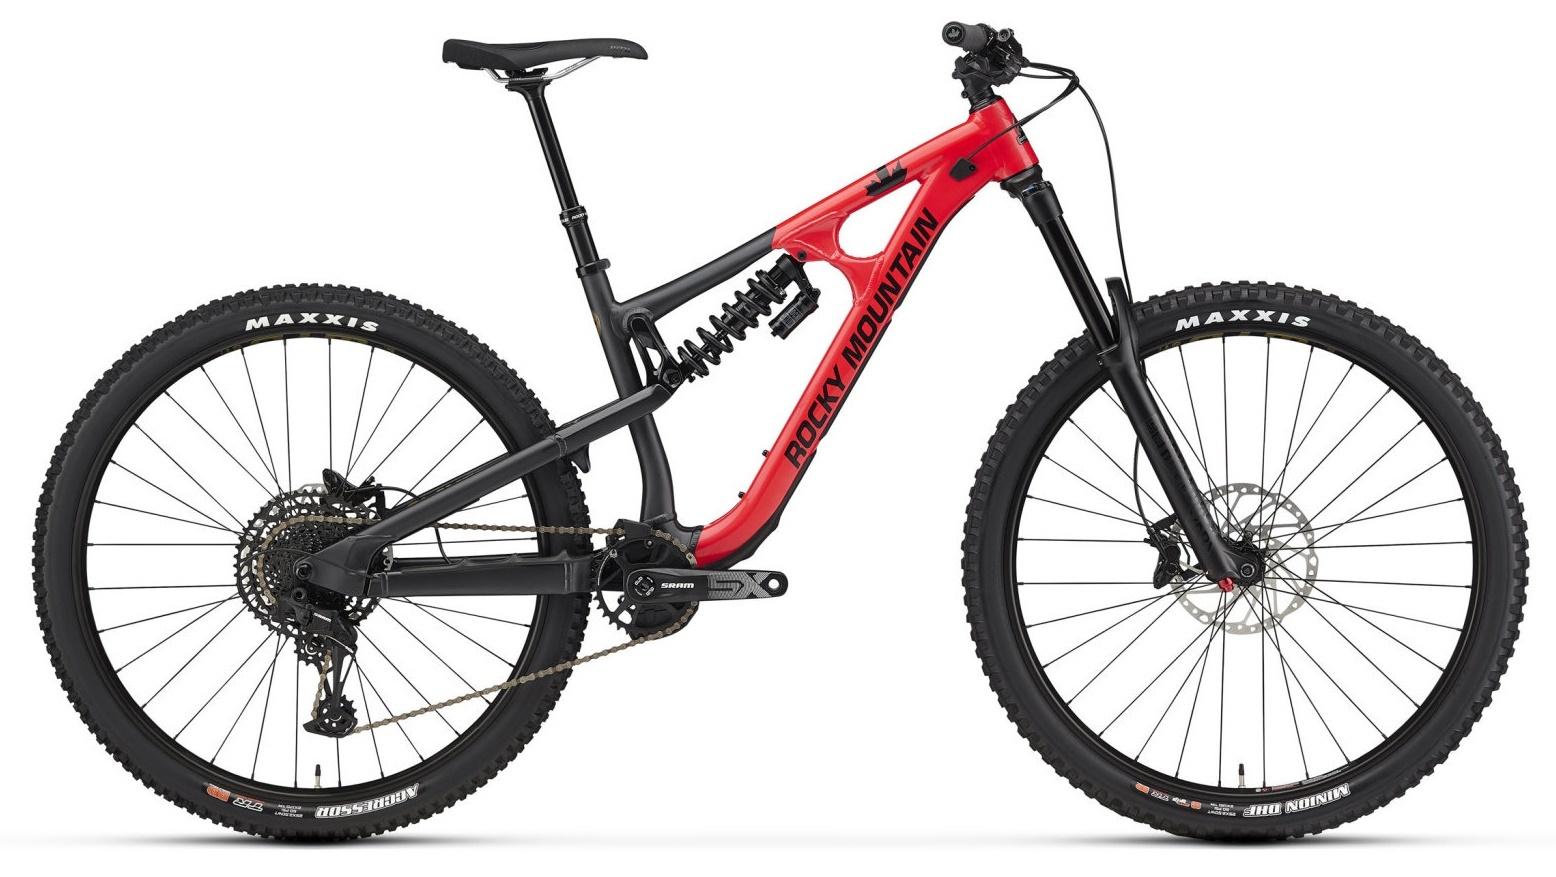 Rocky Mountain Slayer A30 29 Bike 2020 Red/Black Large